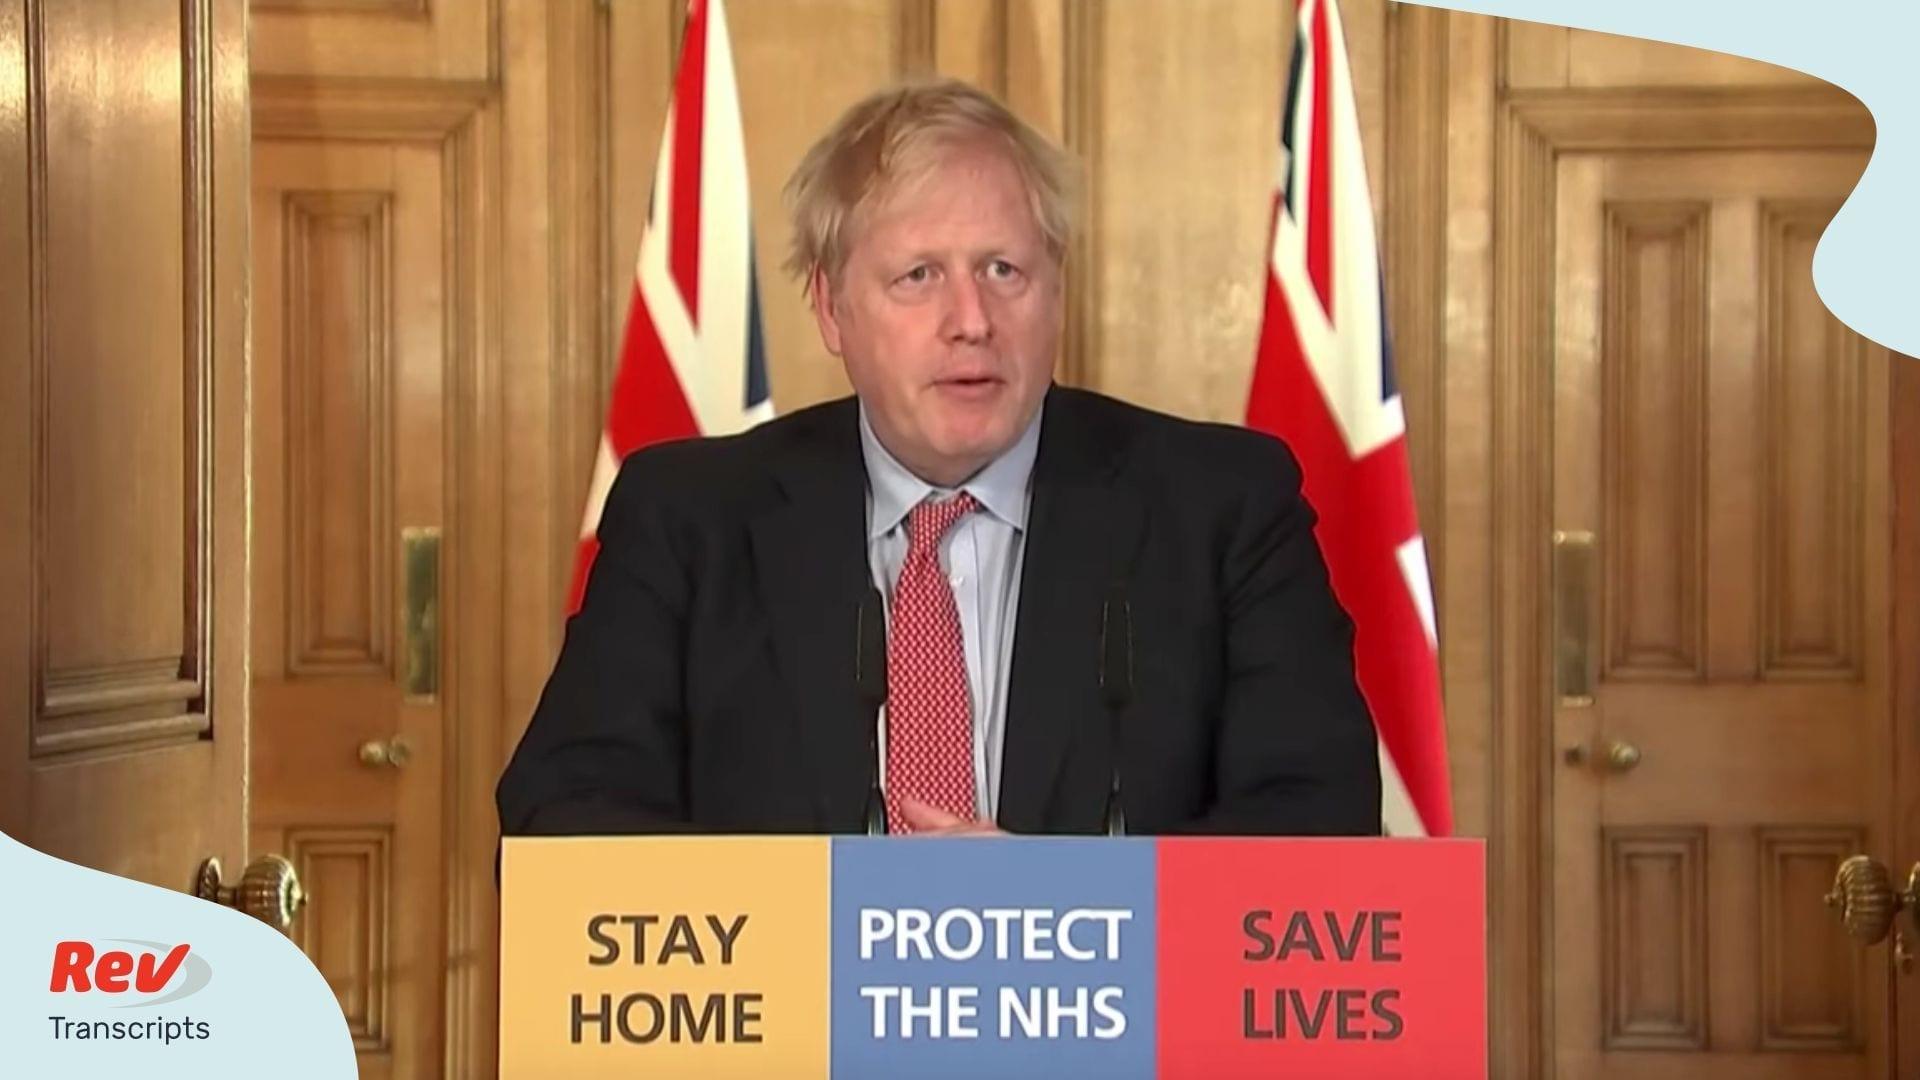 Boris Johnson Briefing Coronavirus March 25